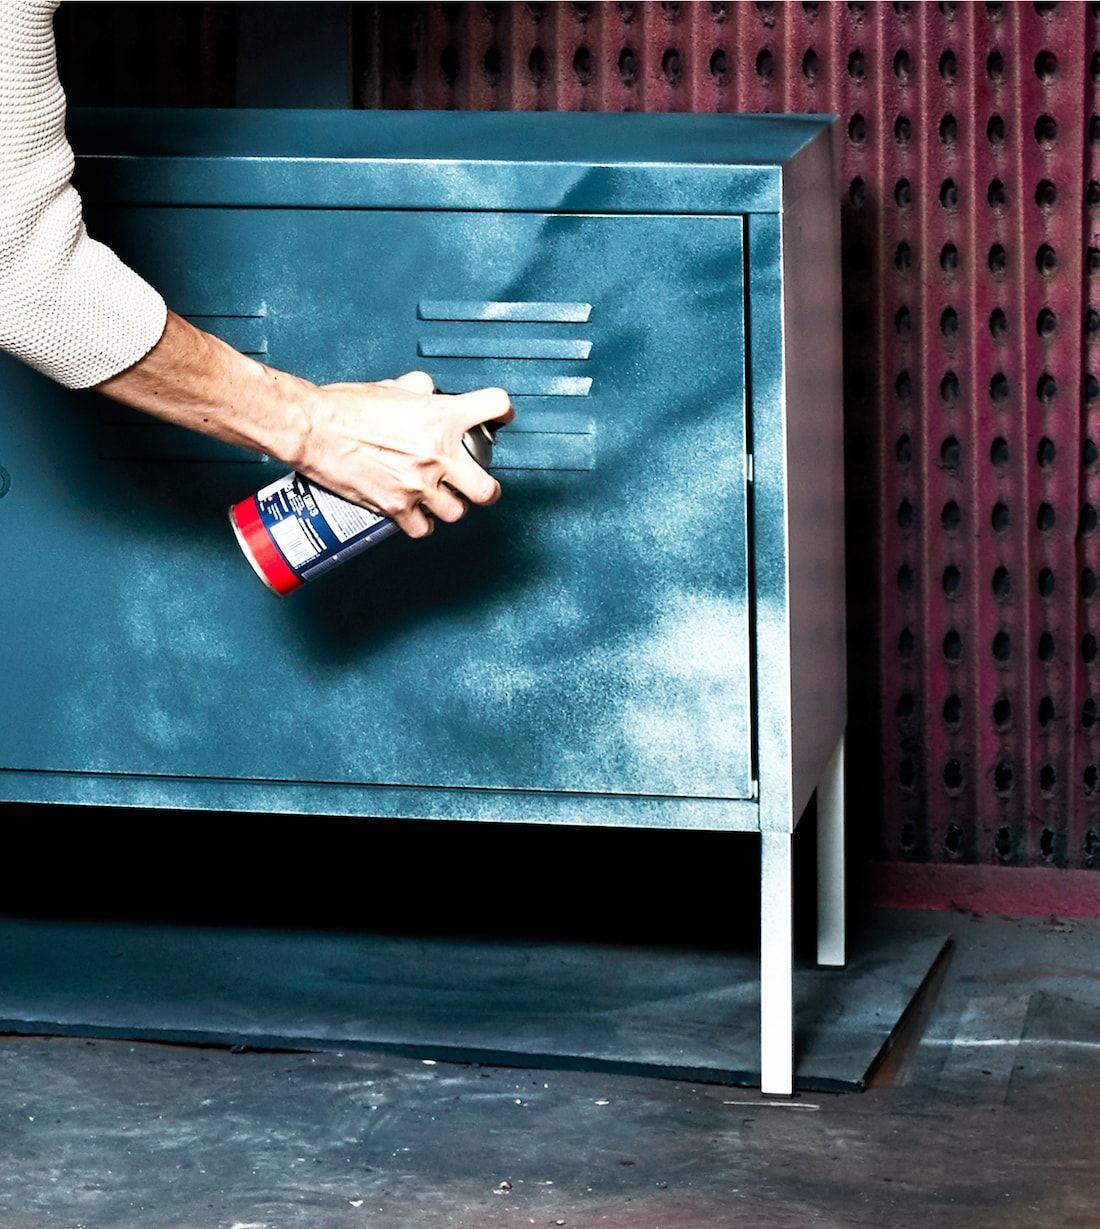 alte m bel neu gestalten in 2019 ikea ikea metal. Black Bedroom Furniture Sets. Home Design Ideas